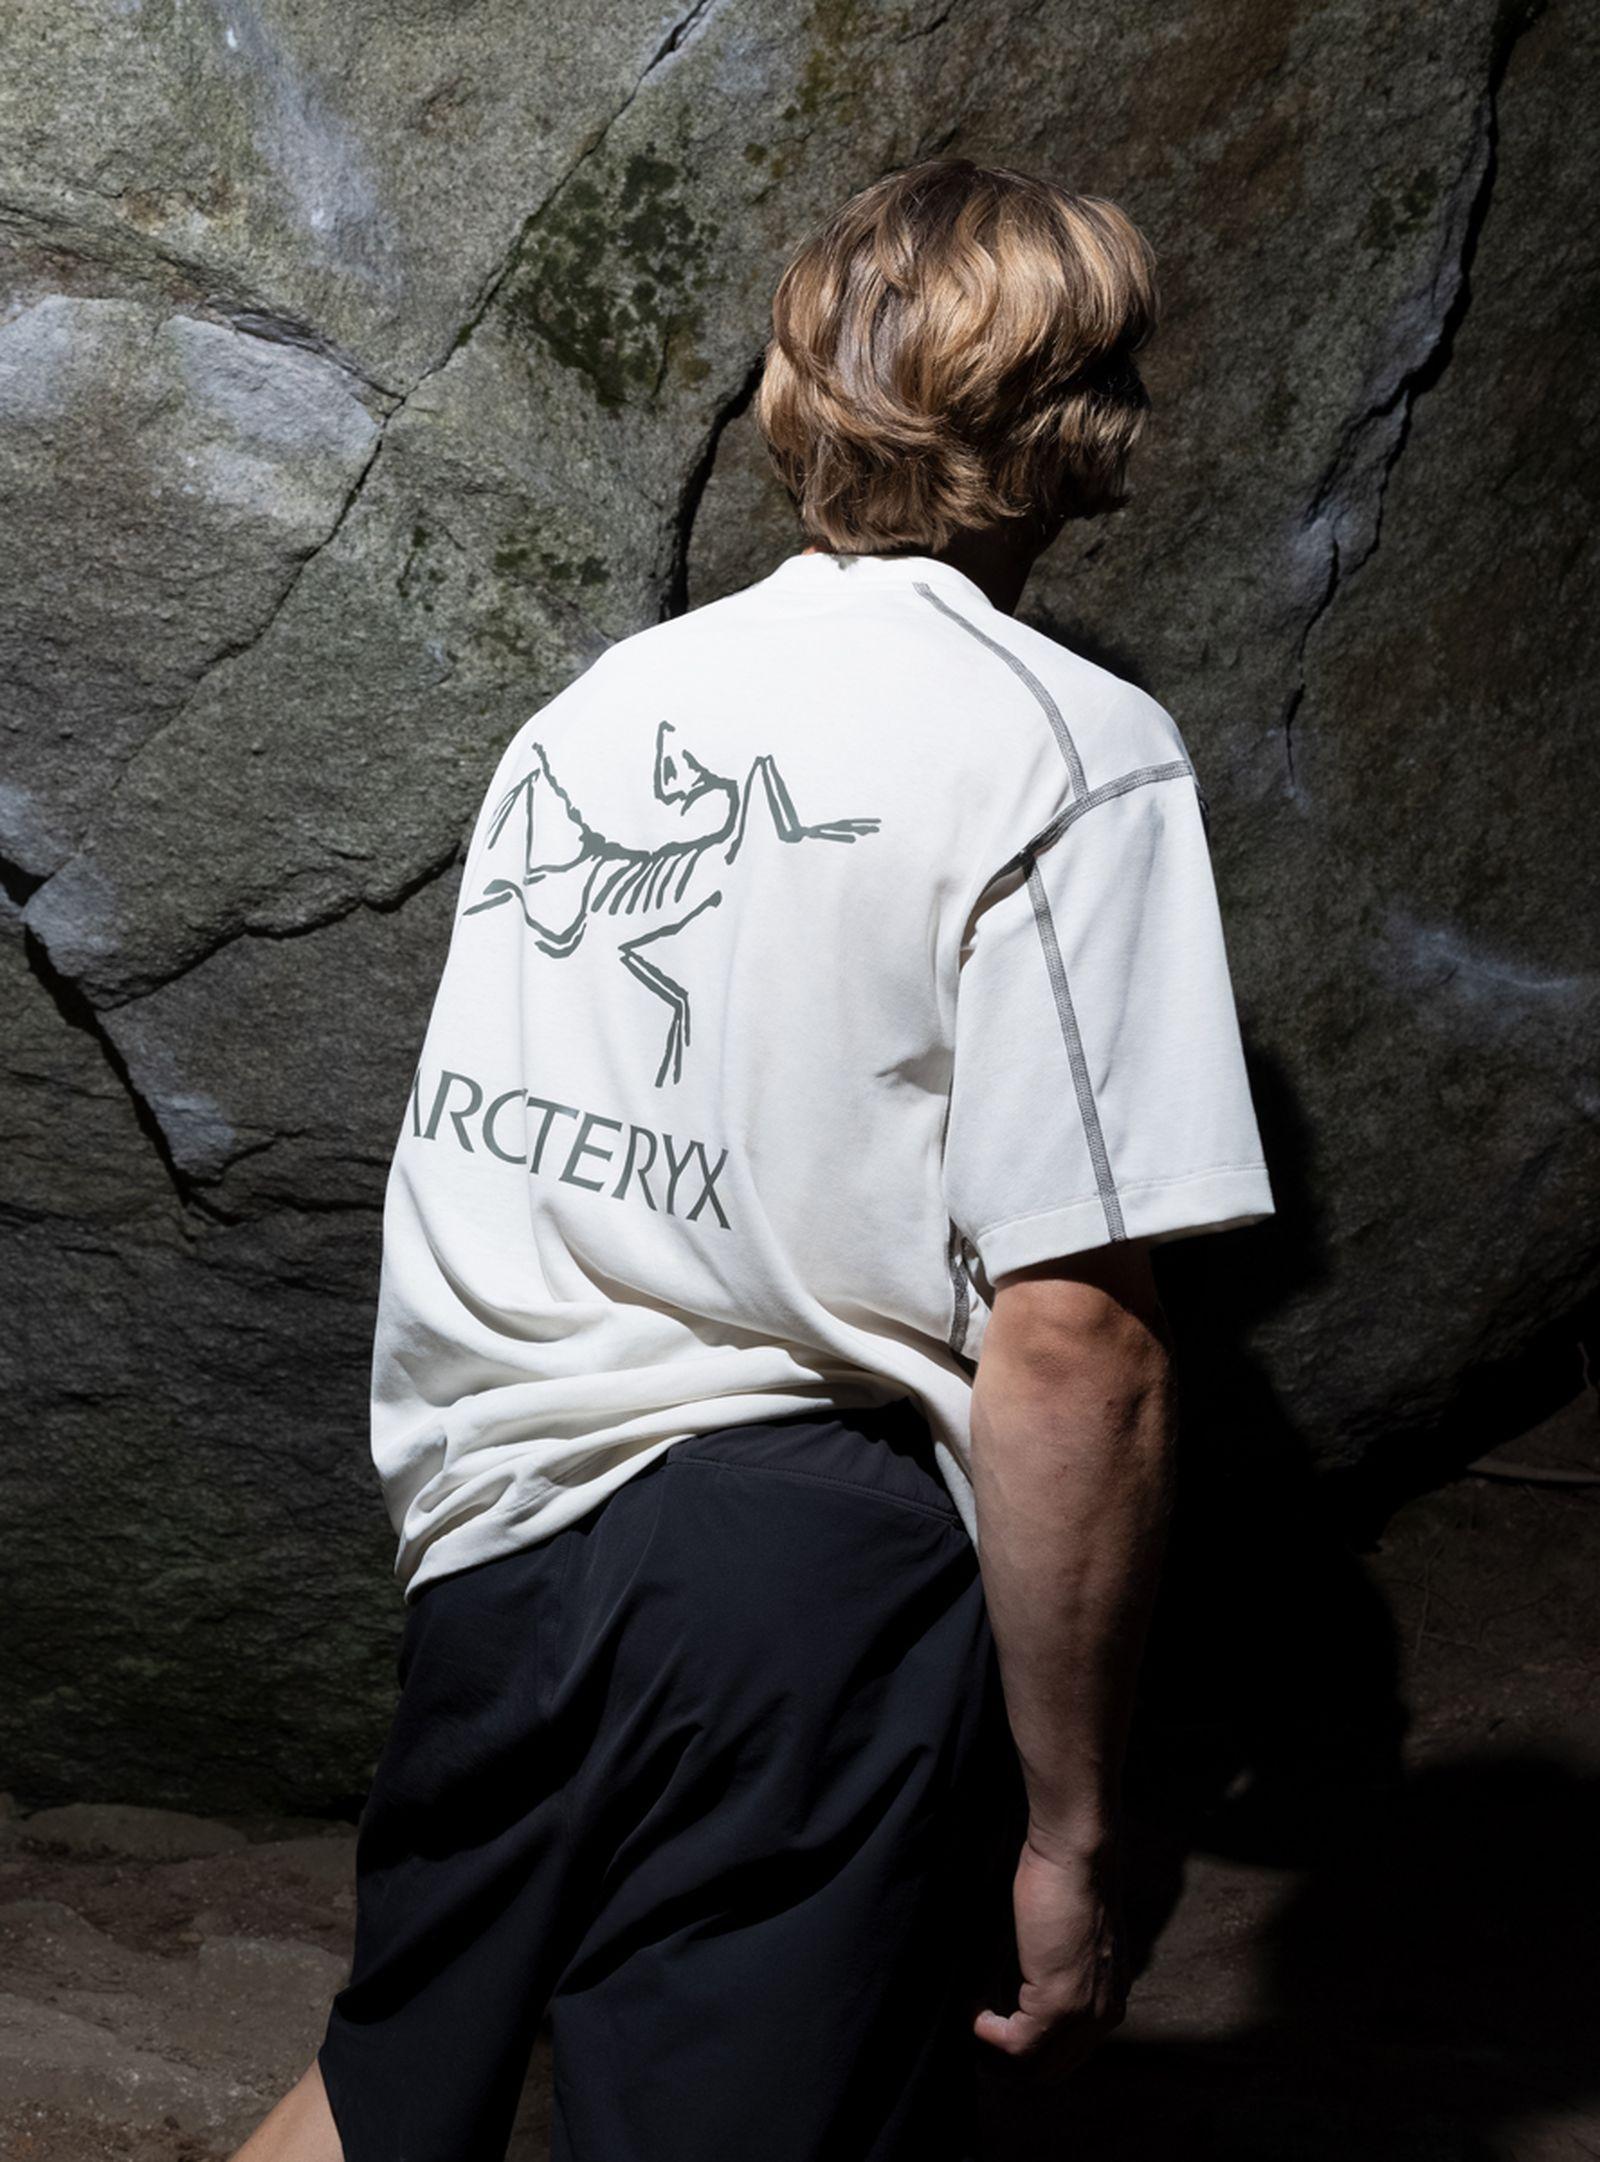 arcteryx-system_a-collection-lookbook (4)